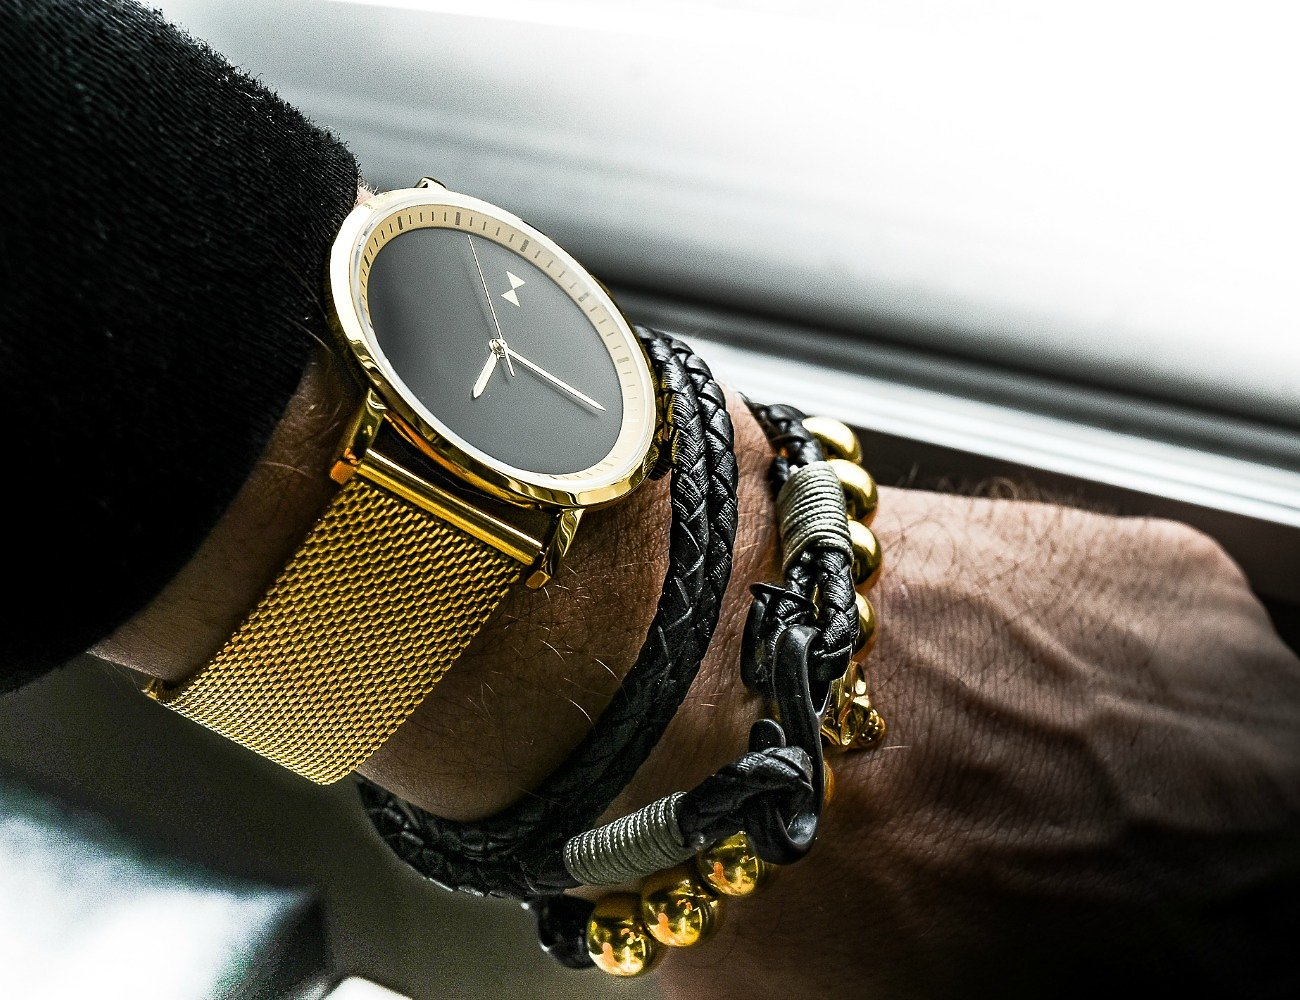 Unisex Modern Watches by Glen Maher